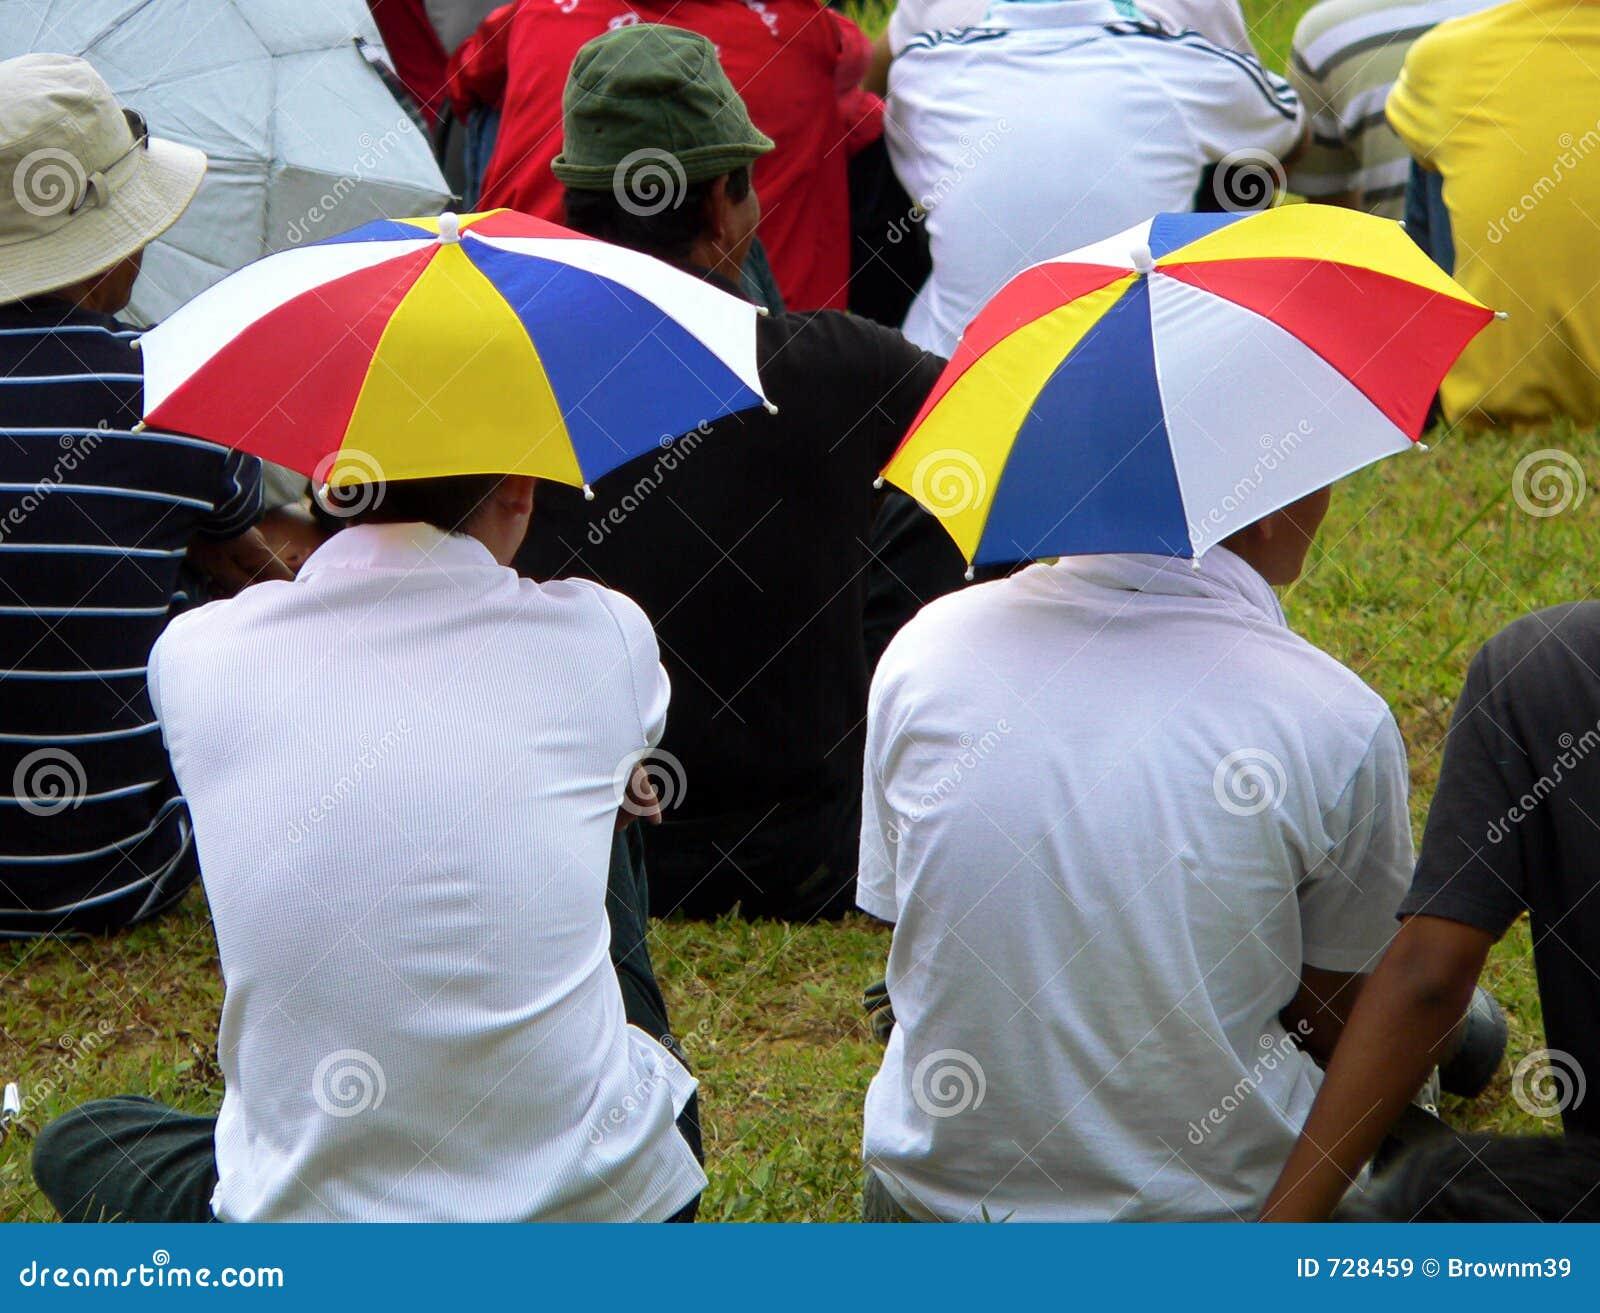 Parapluies principaux